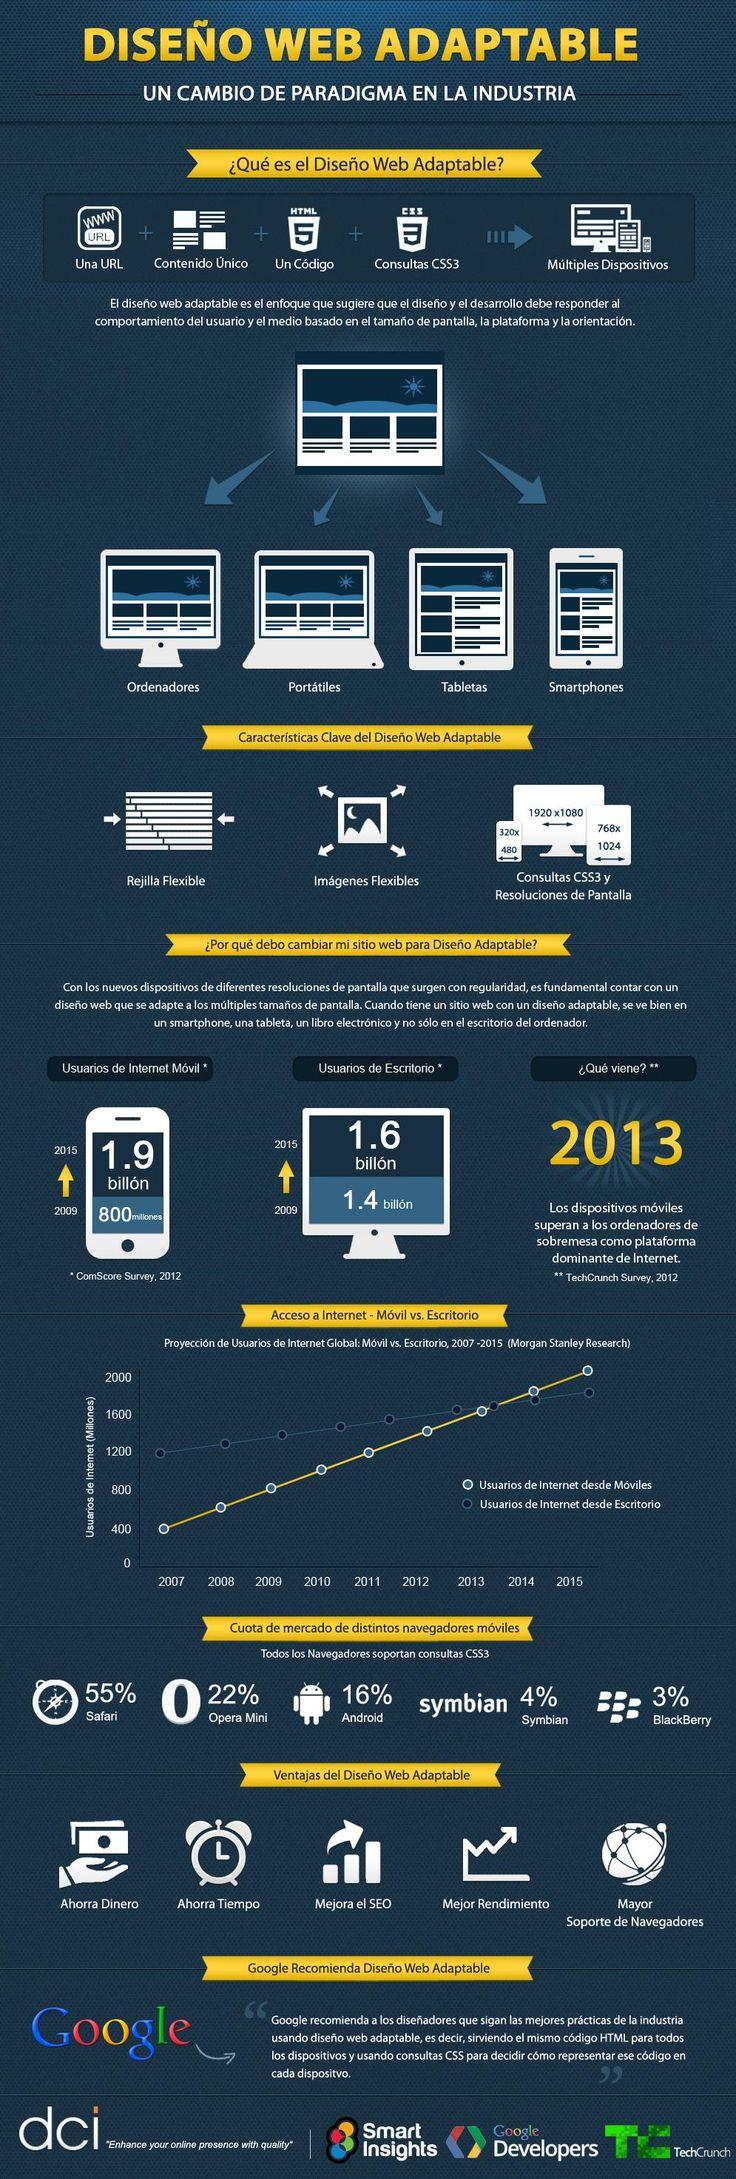 Infografia Diseño Web Adaptable #infographics #disenoweb #webdesign http://www.dweb3d.com/blog/blogs/diseno-web-y-posicionamiento-seo/145-diseno-web-adaptable.html